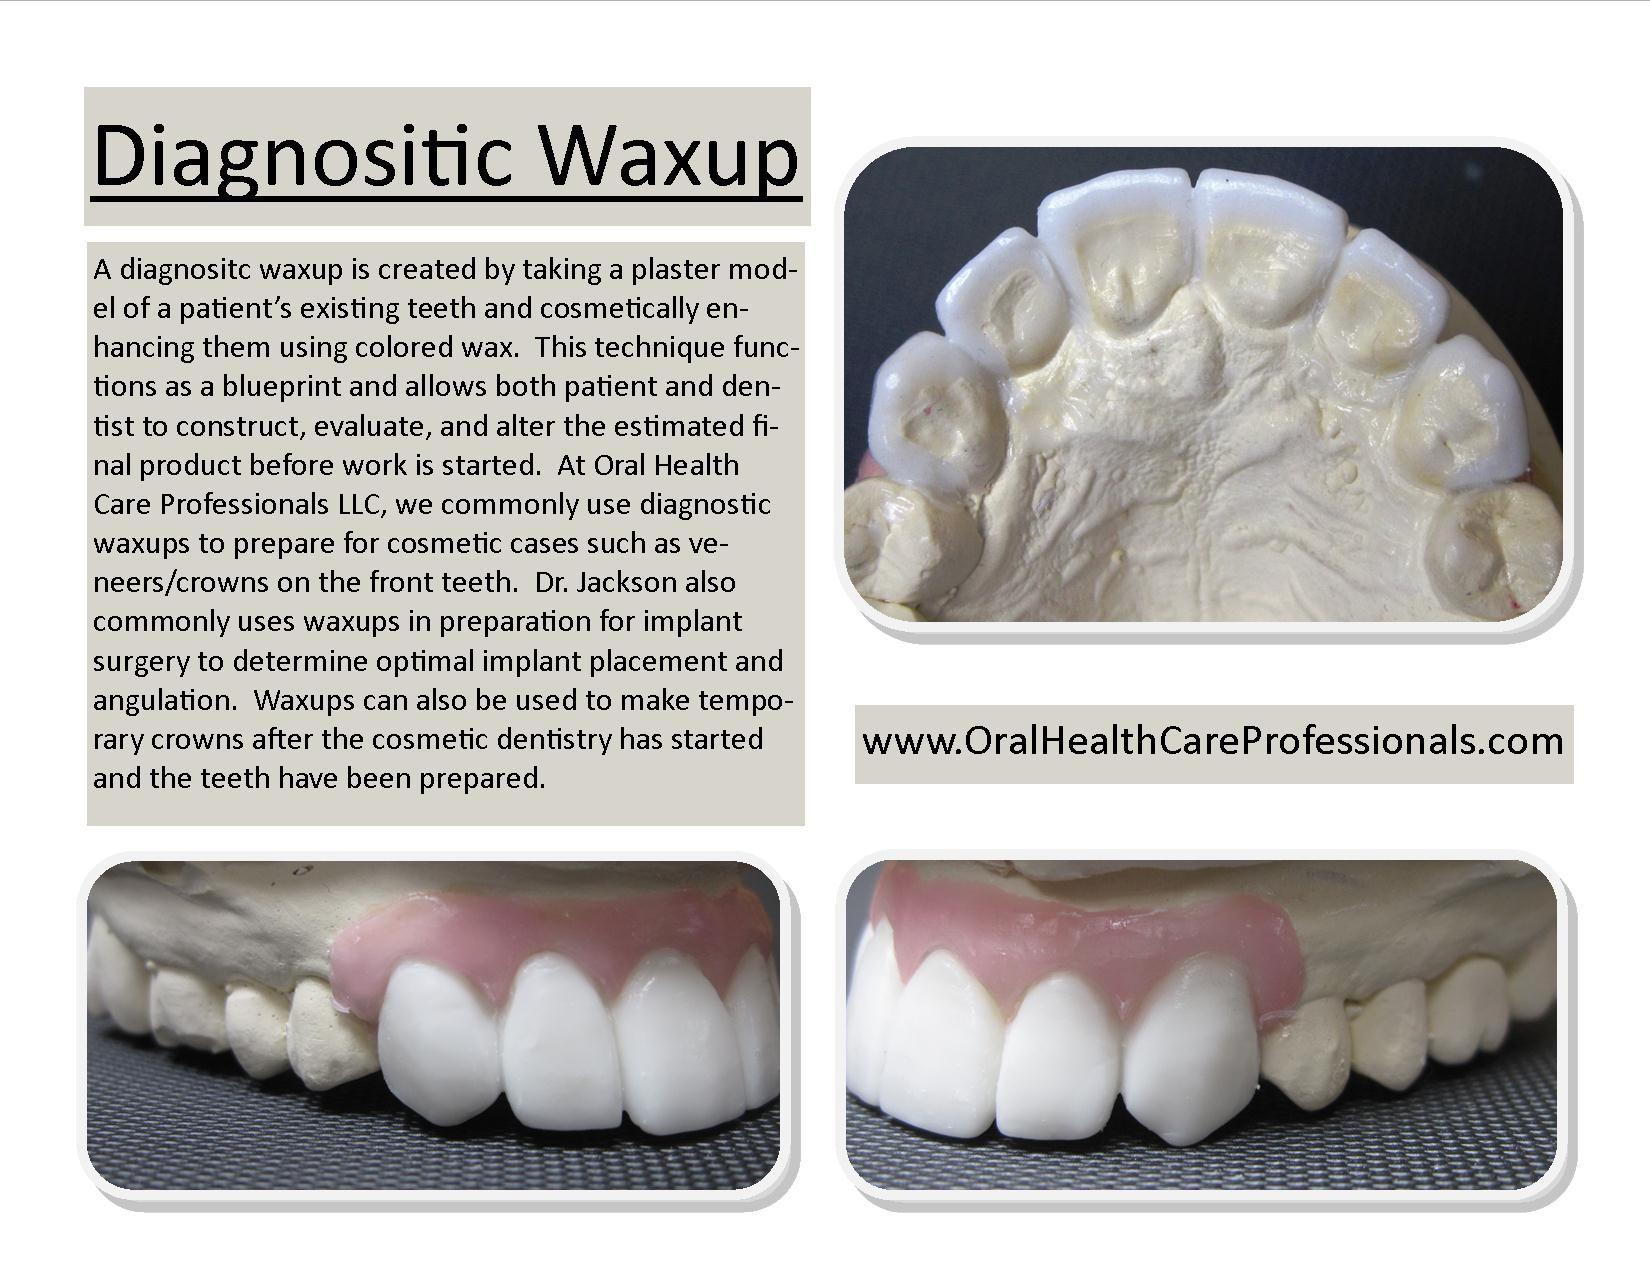 Oral Health Care Professionals Llc Jeffrey S Wascher Dds Eric G Jackson Dds Dentist Downers Grove Il 60515 Dental Dental Hygienist Gifts Dental Ceramics